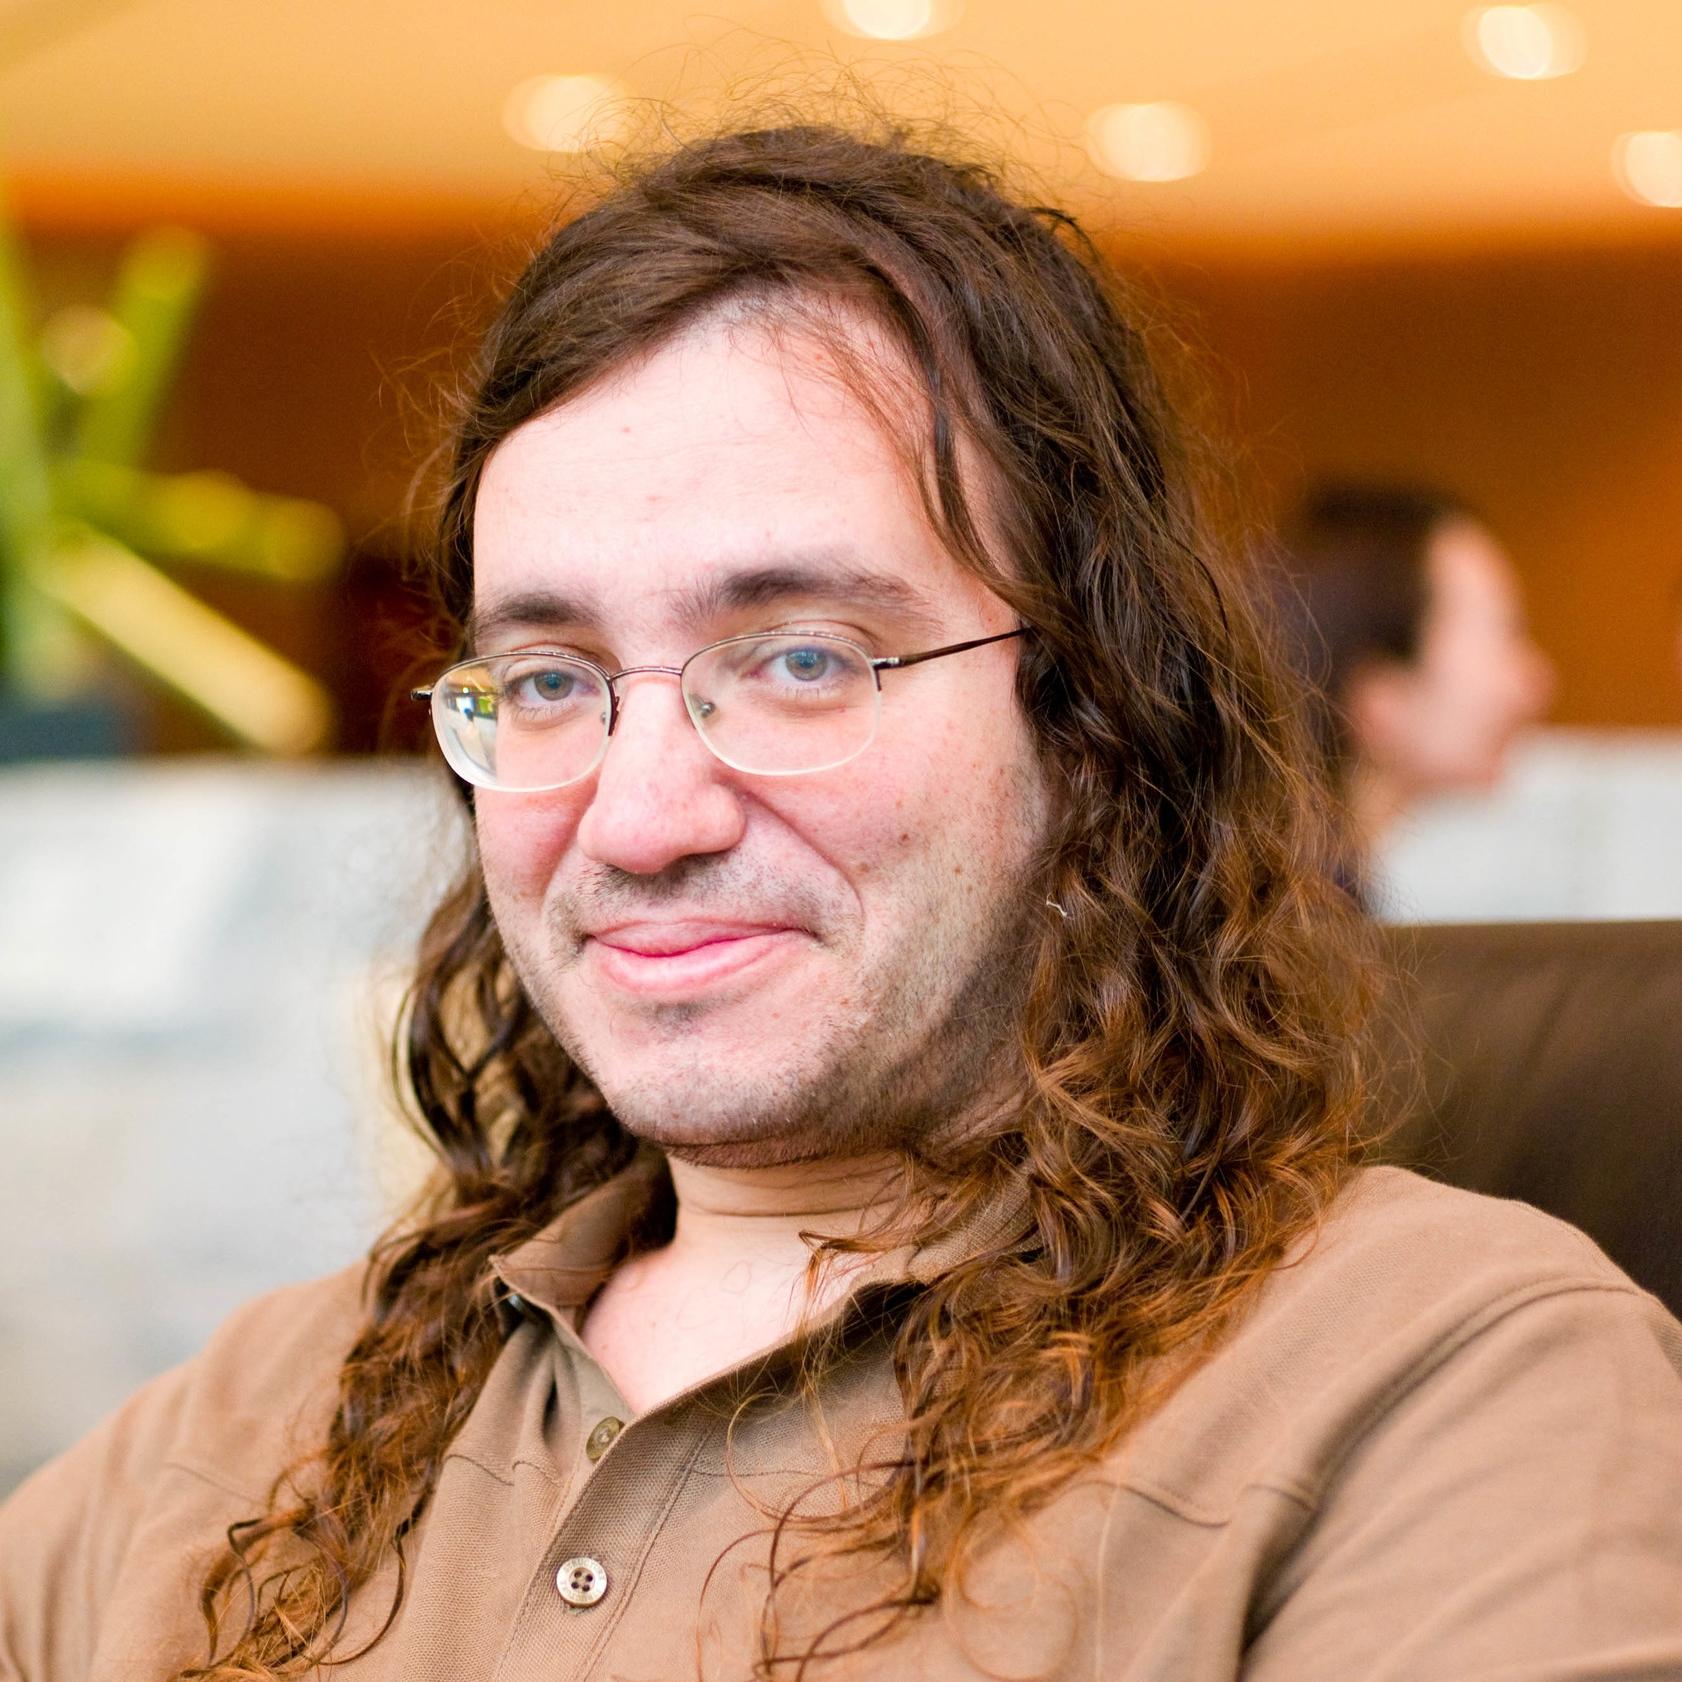 Dr. Ben Goertzel